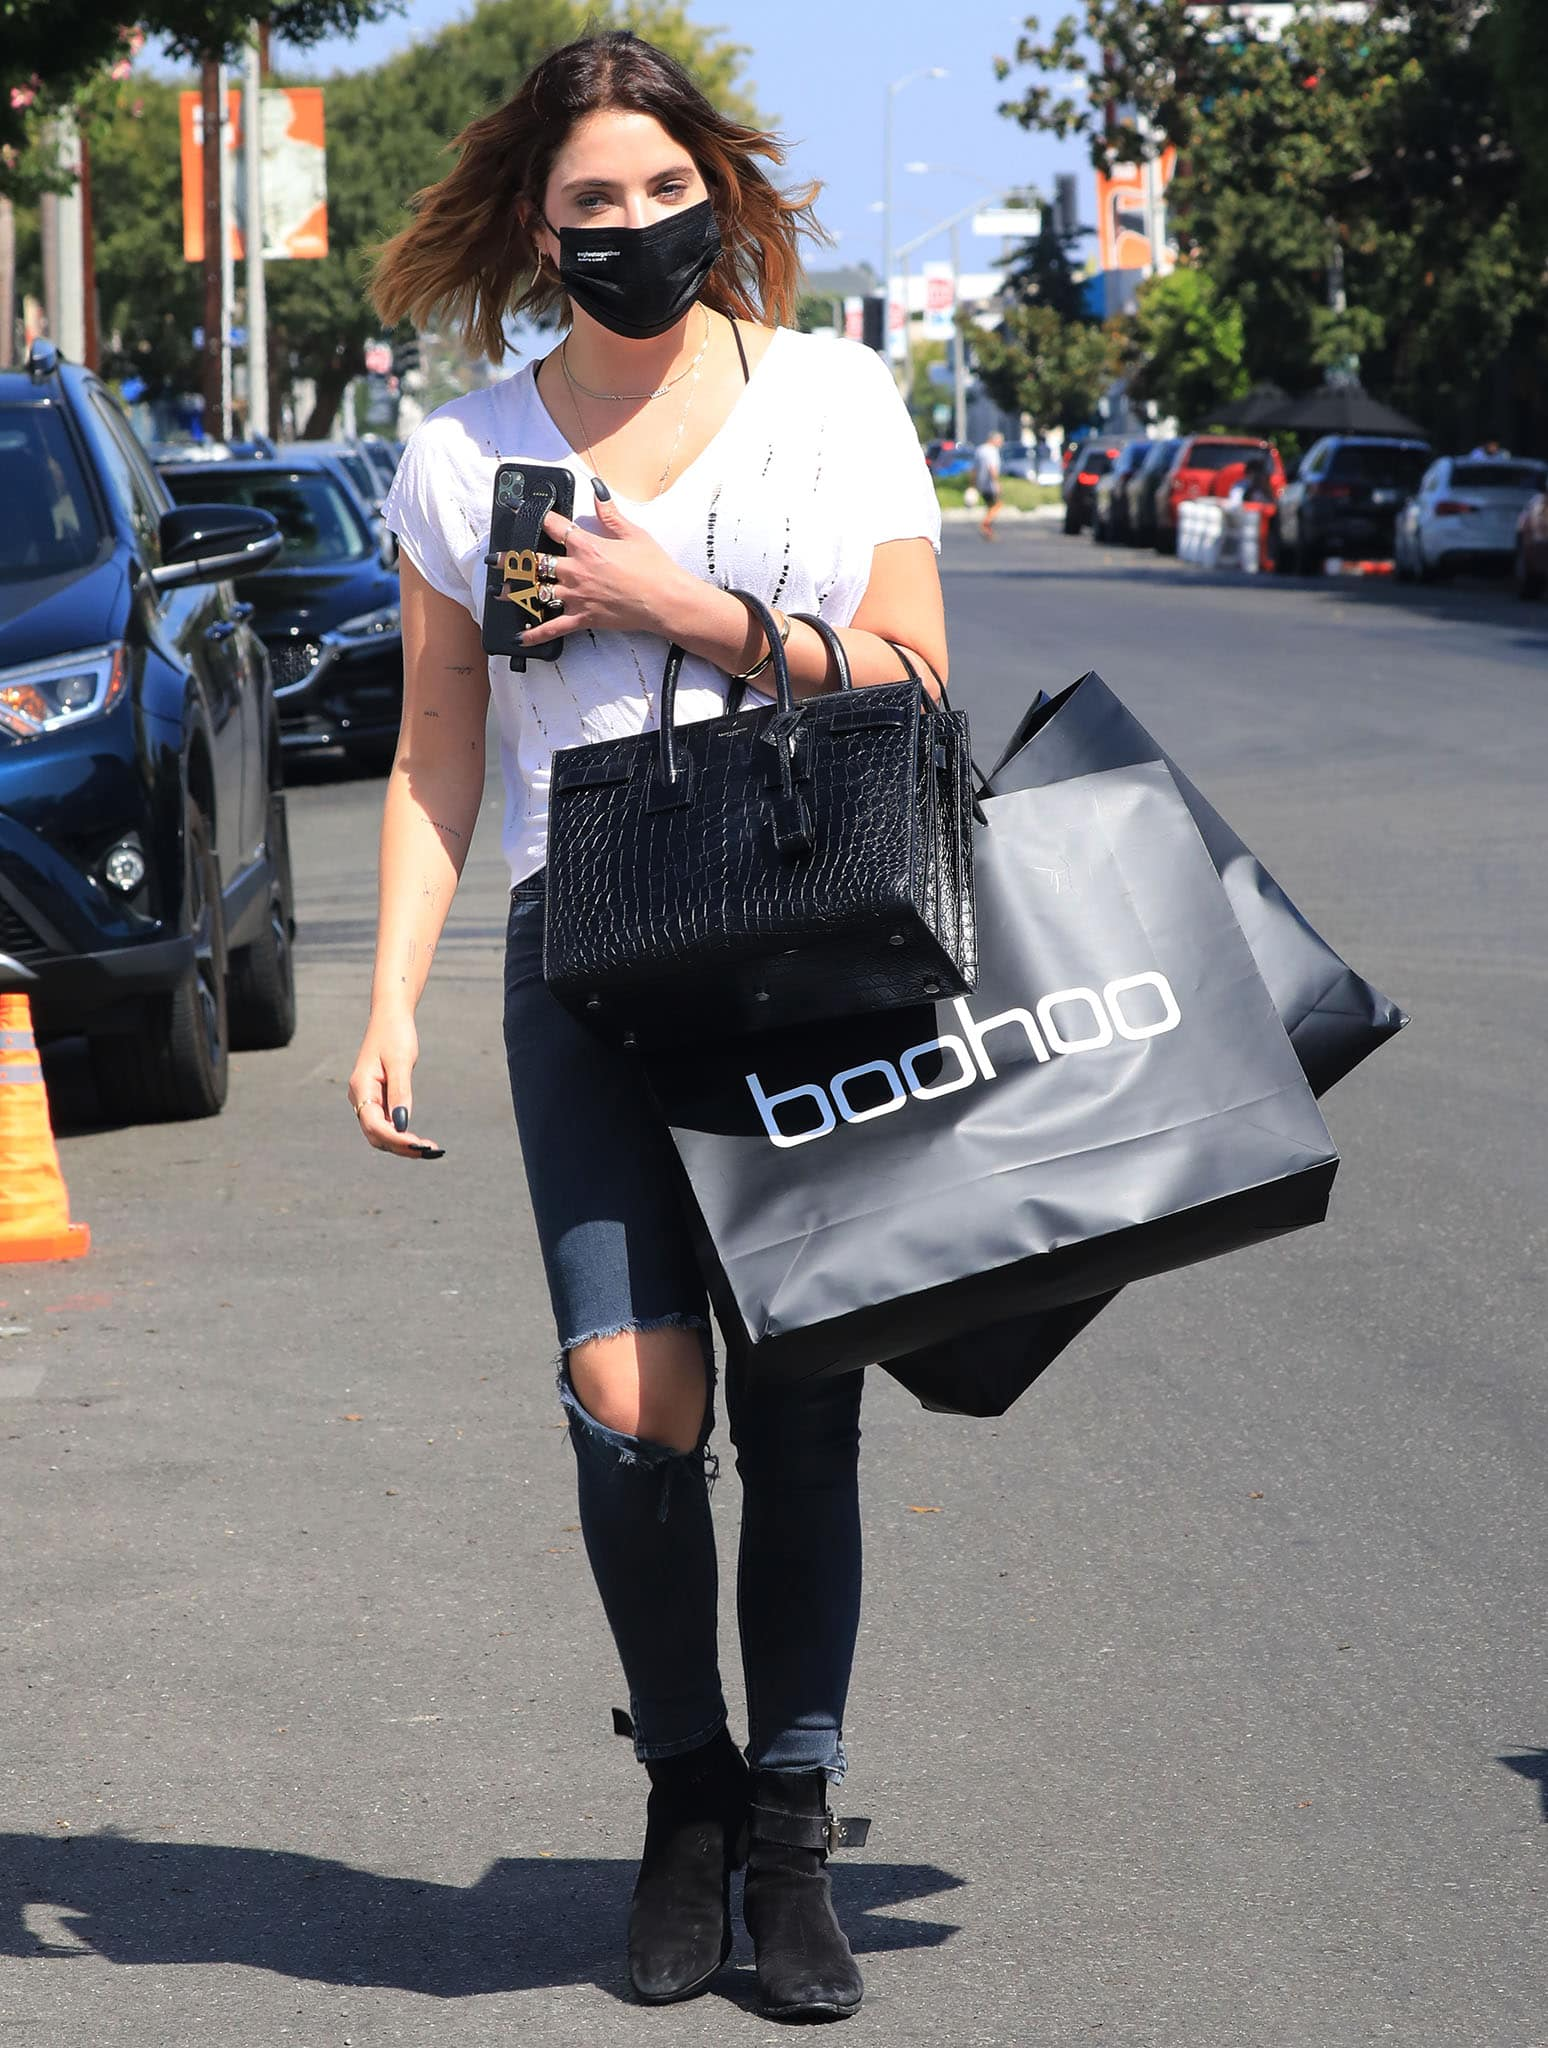 Biker babe Ashley Benson goes shopping at Boohoo boutique